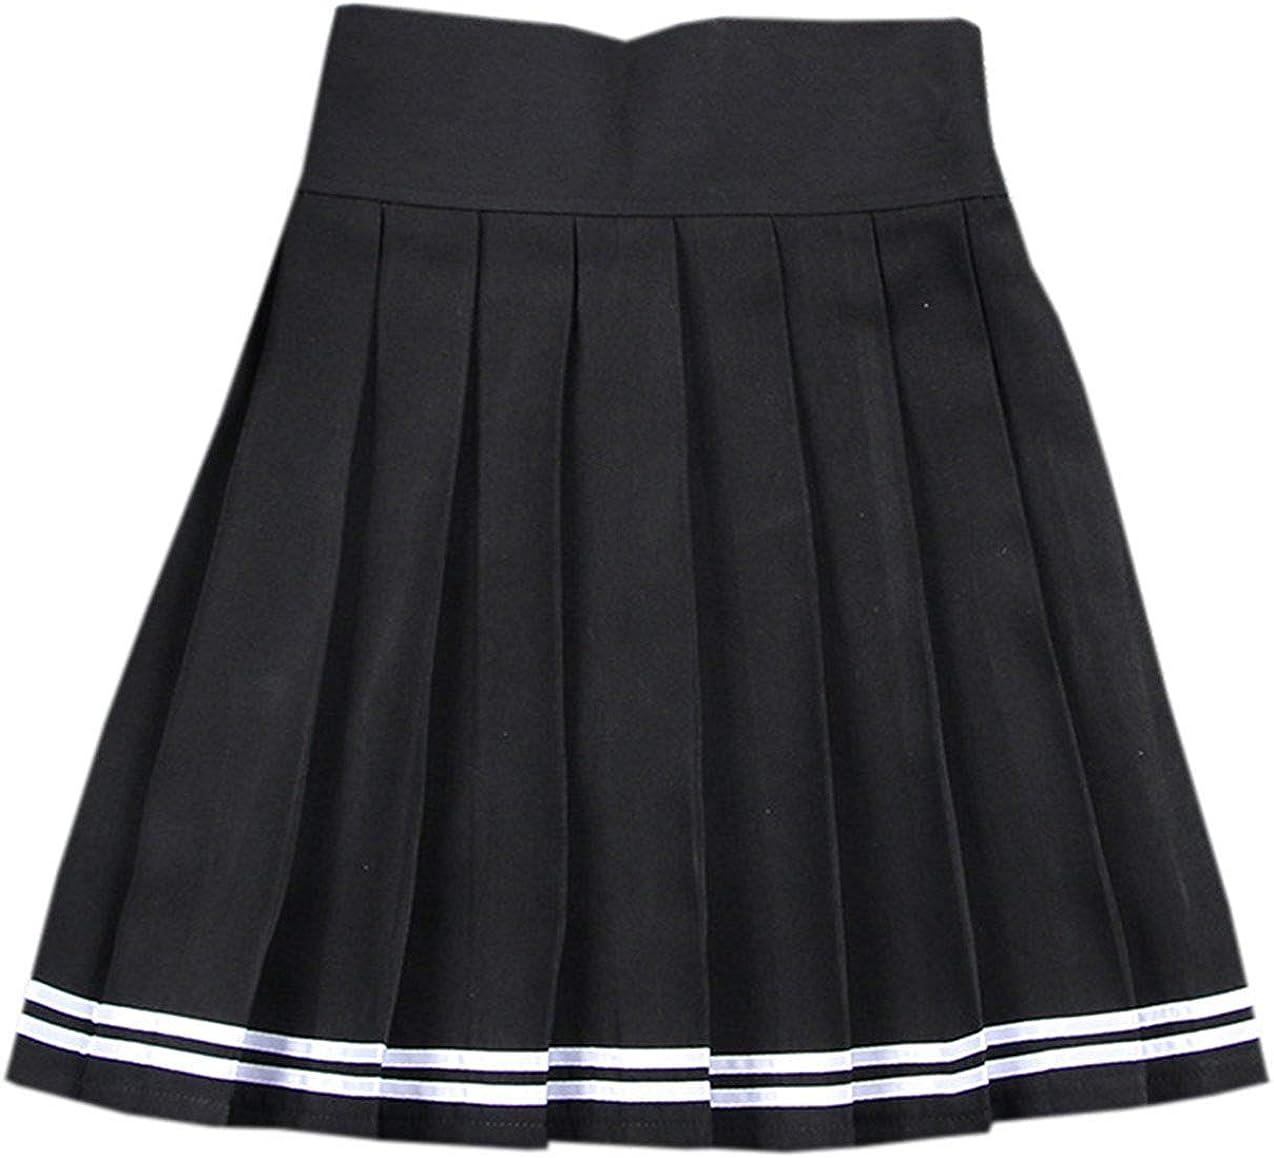 NAWONGSKY Women's Pleated Skirt, XS-XXL